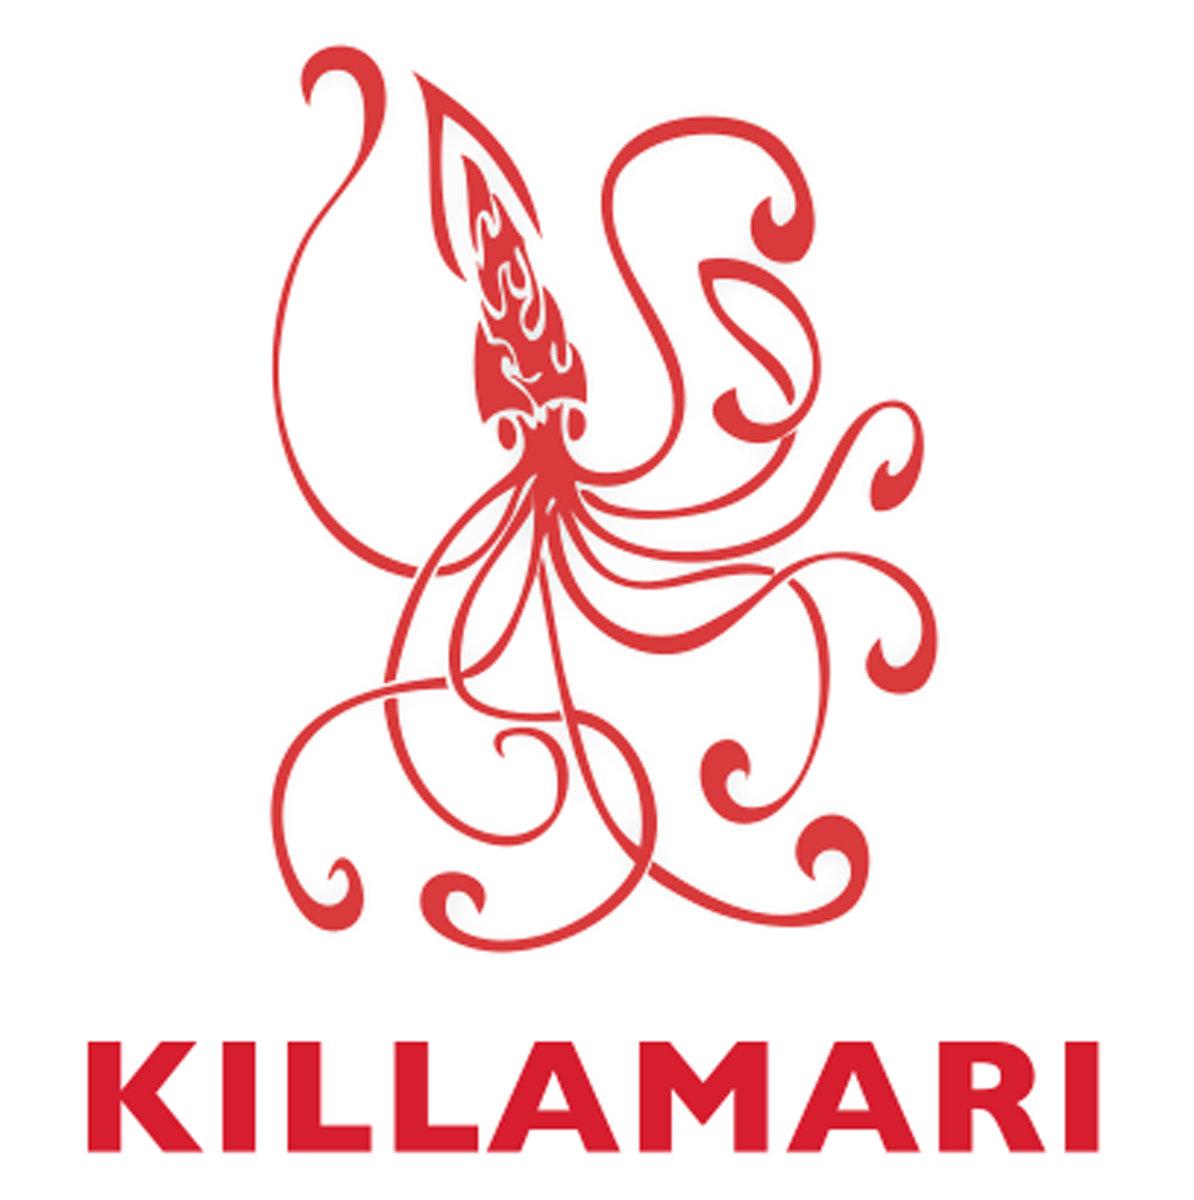 1194x1200 The Life And Crimes Of Killamari Records